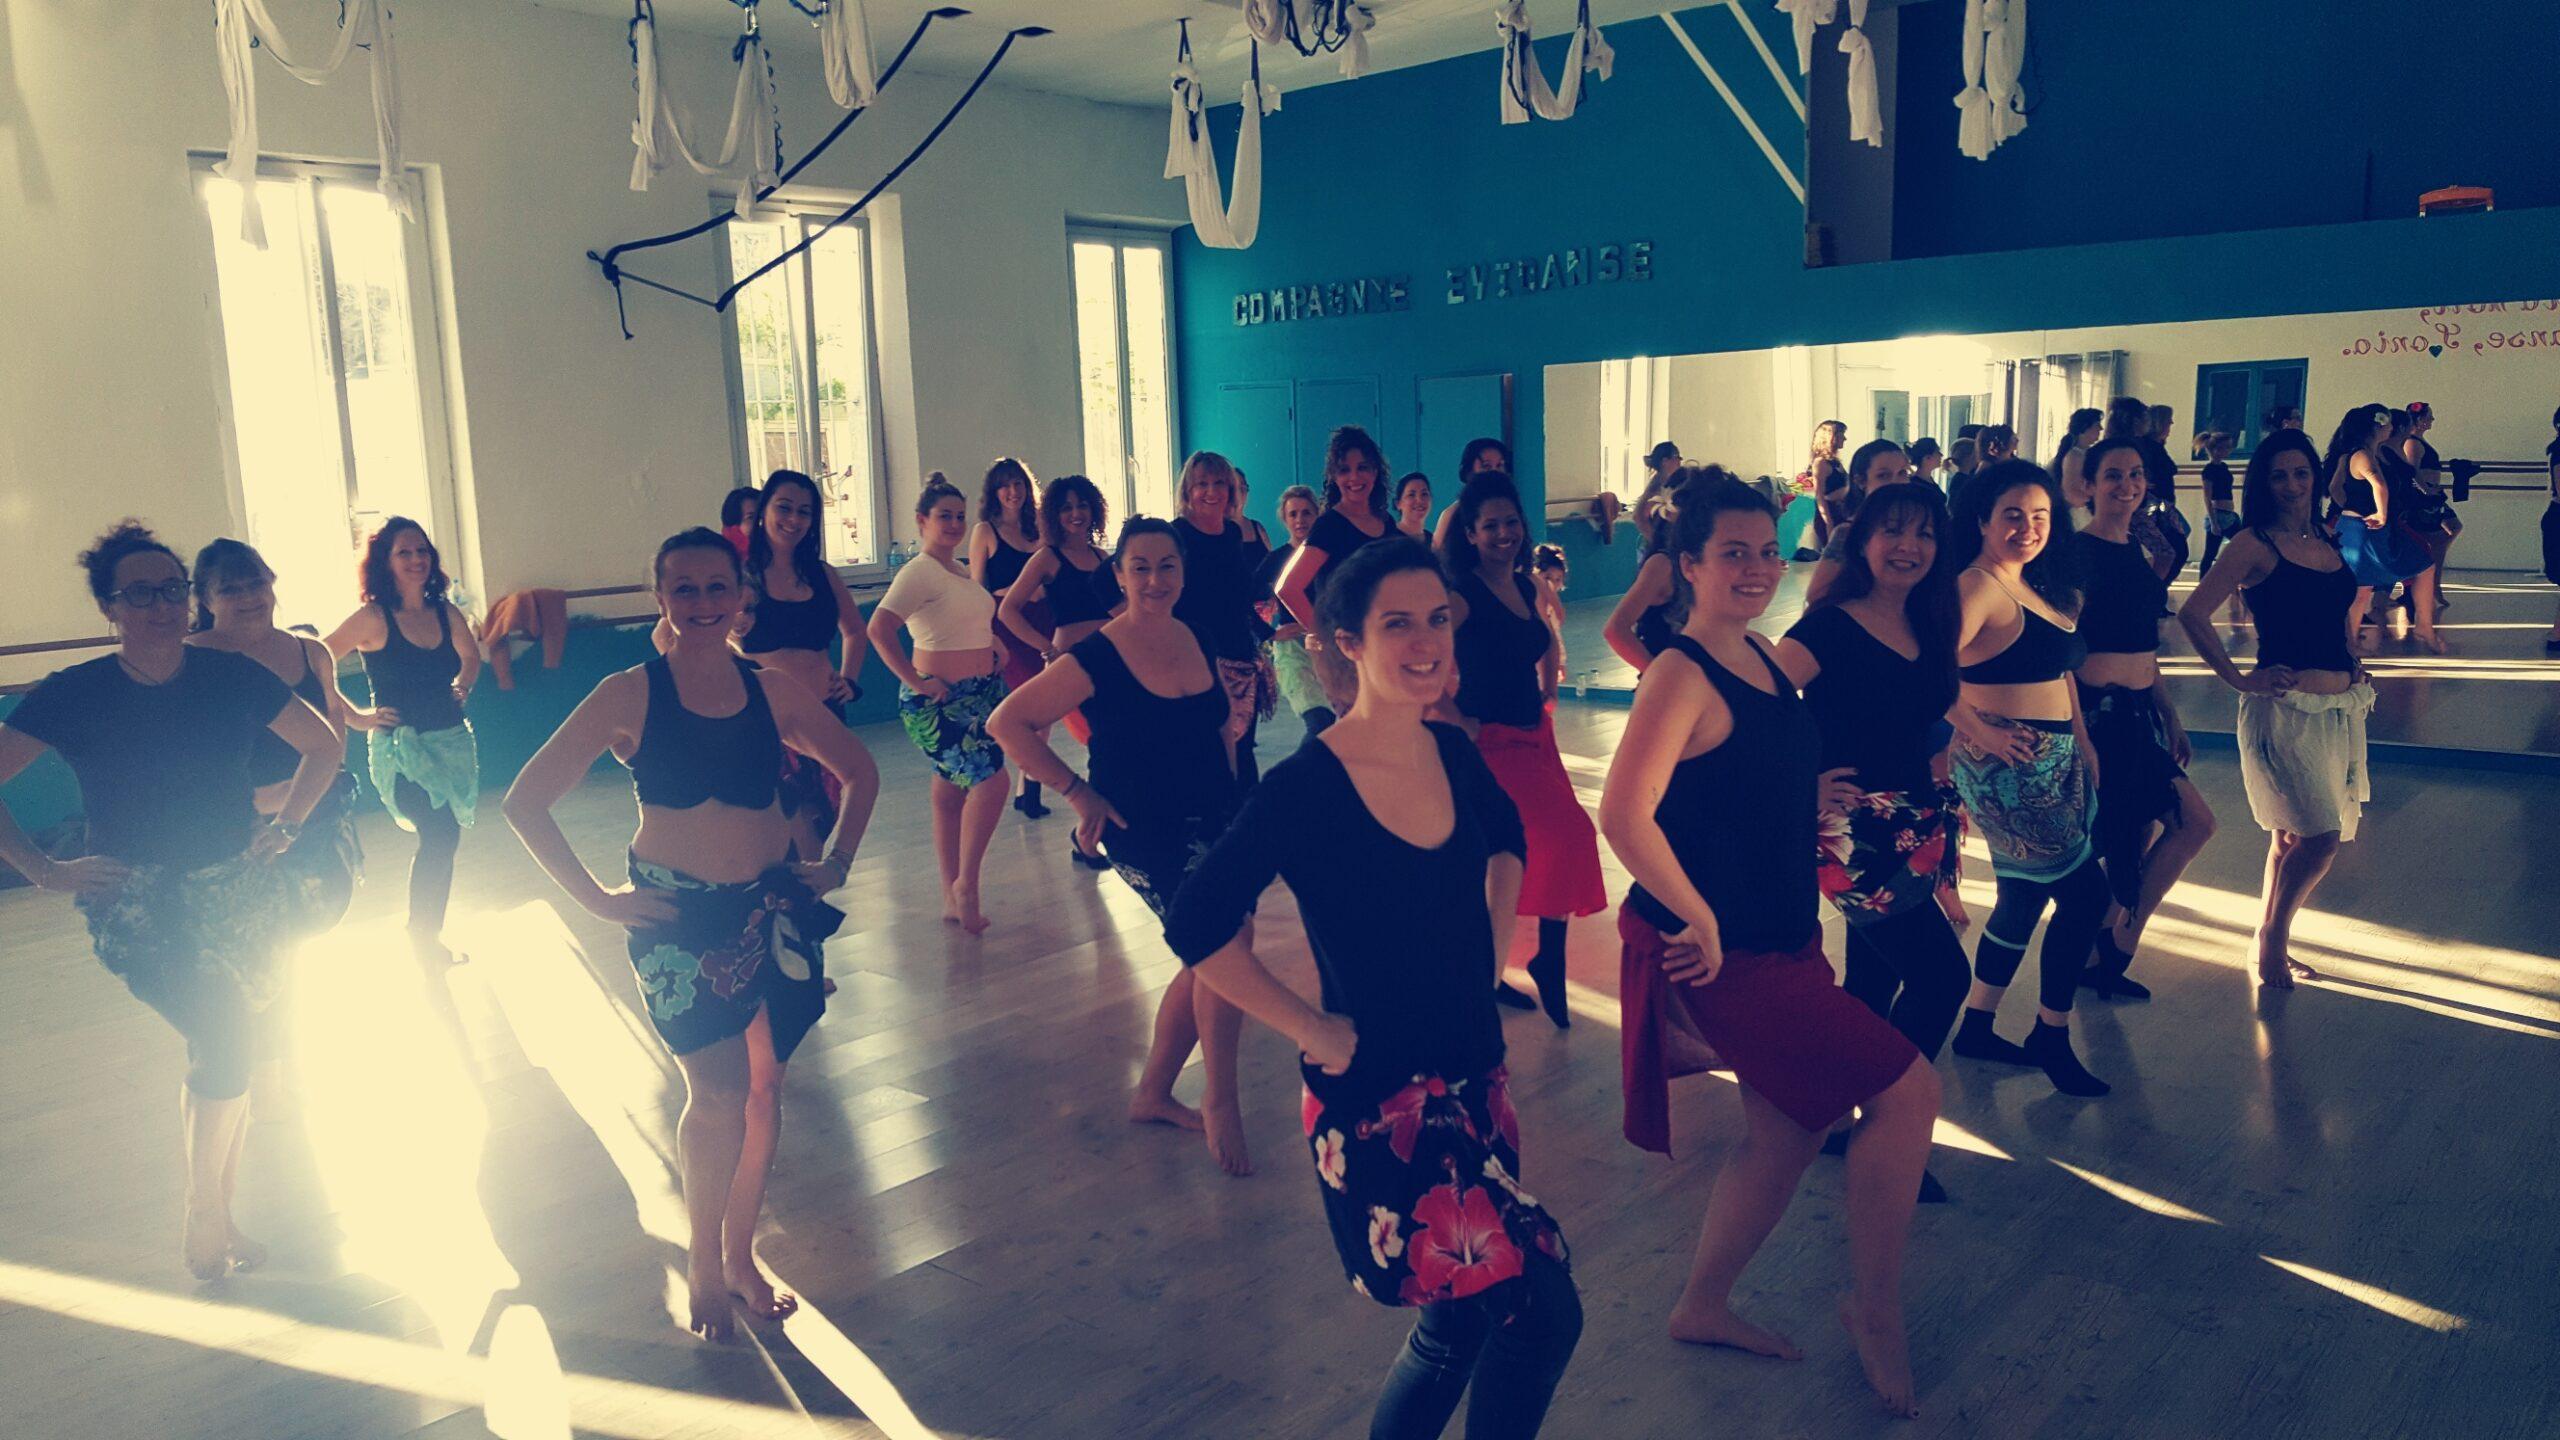 te mahana cours de danse tahitienne marseille